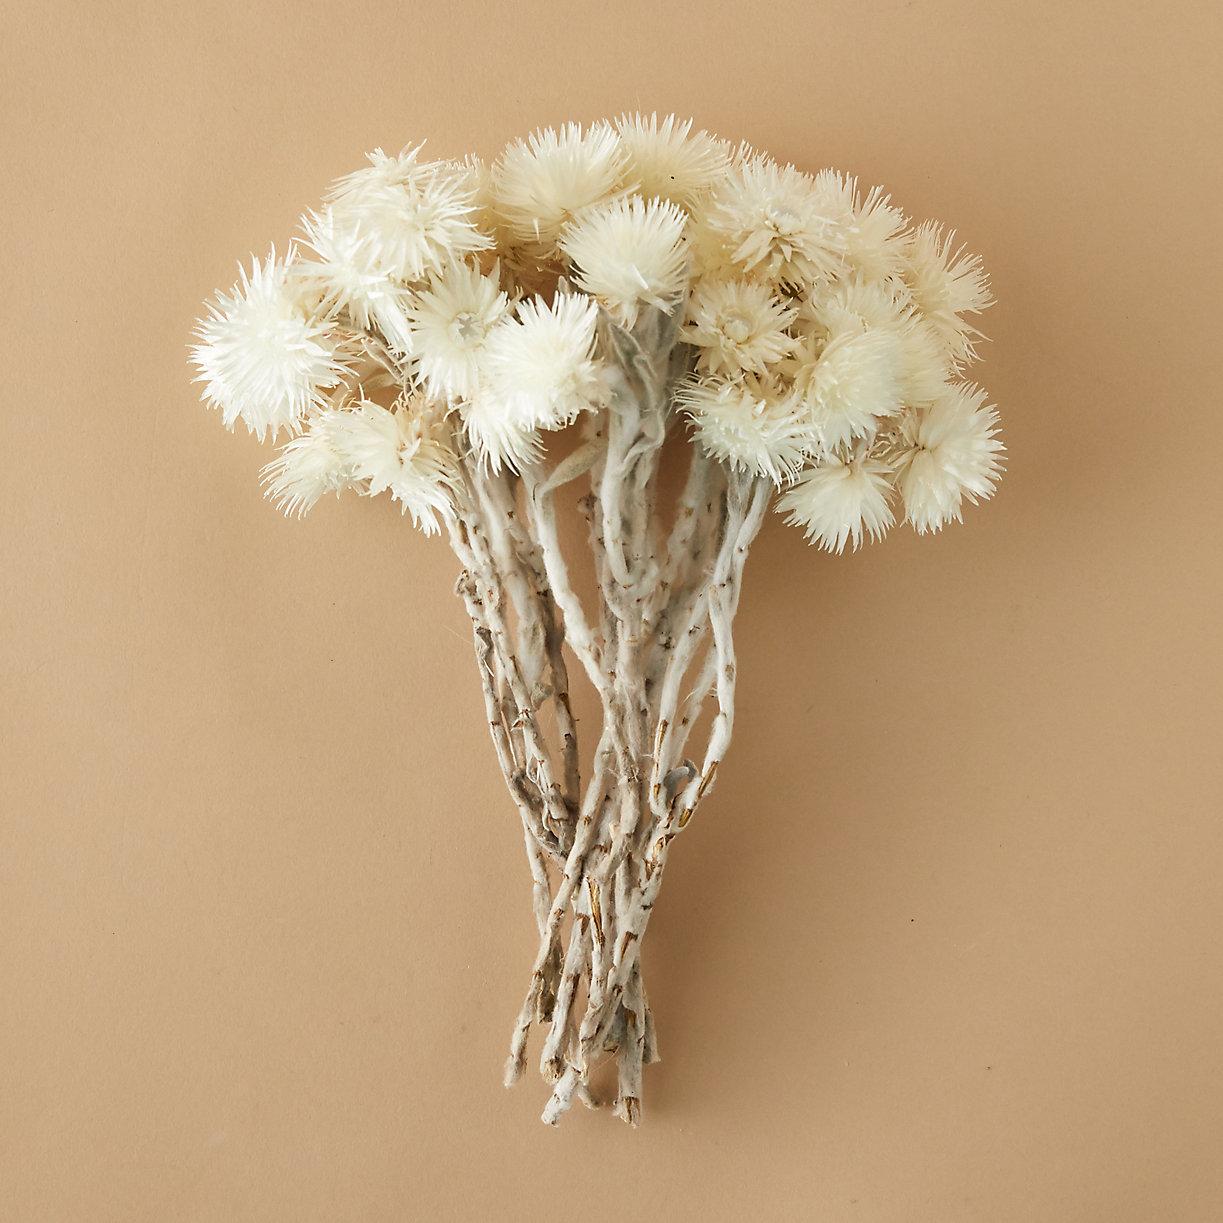 Everlasting Flower Bunch